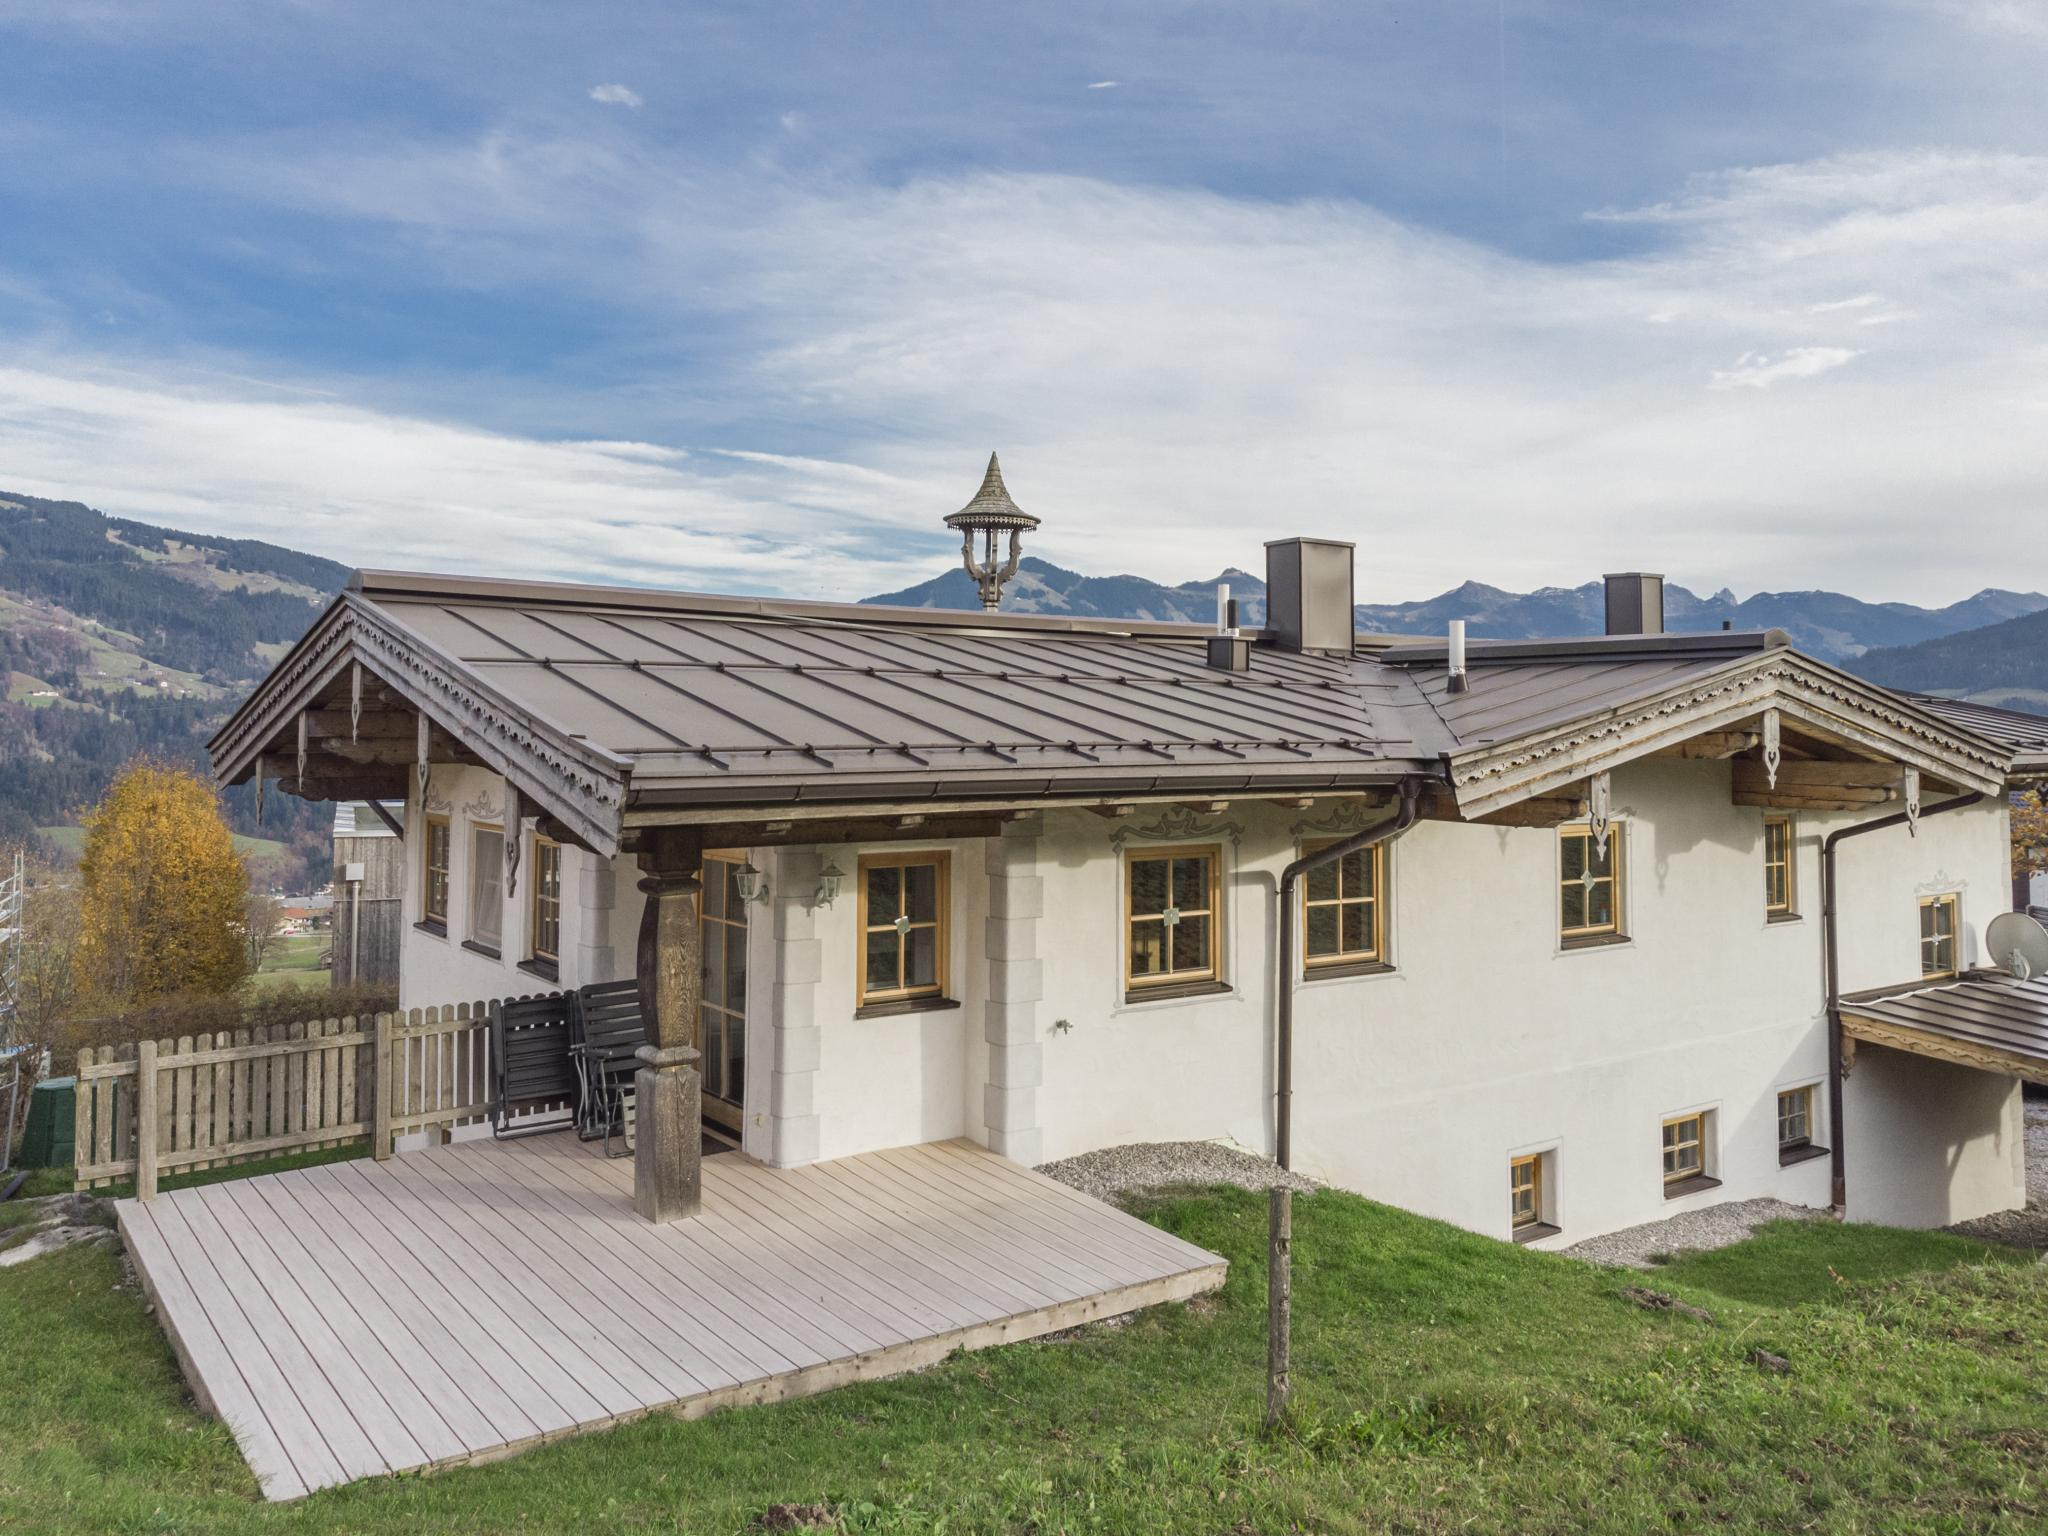 Salvenblick Tirol